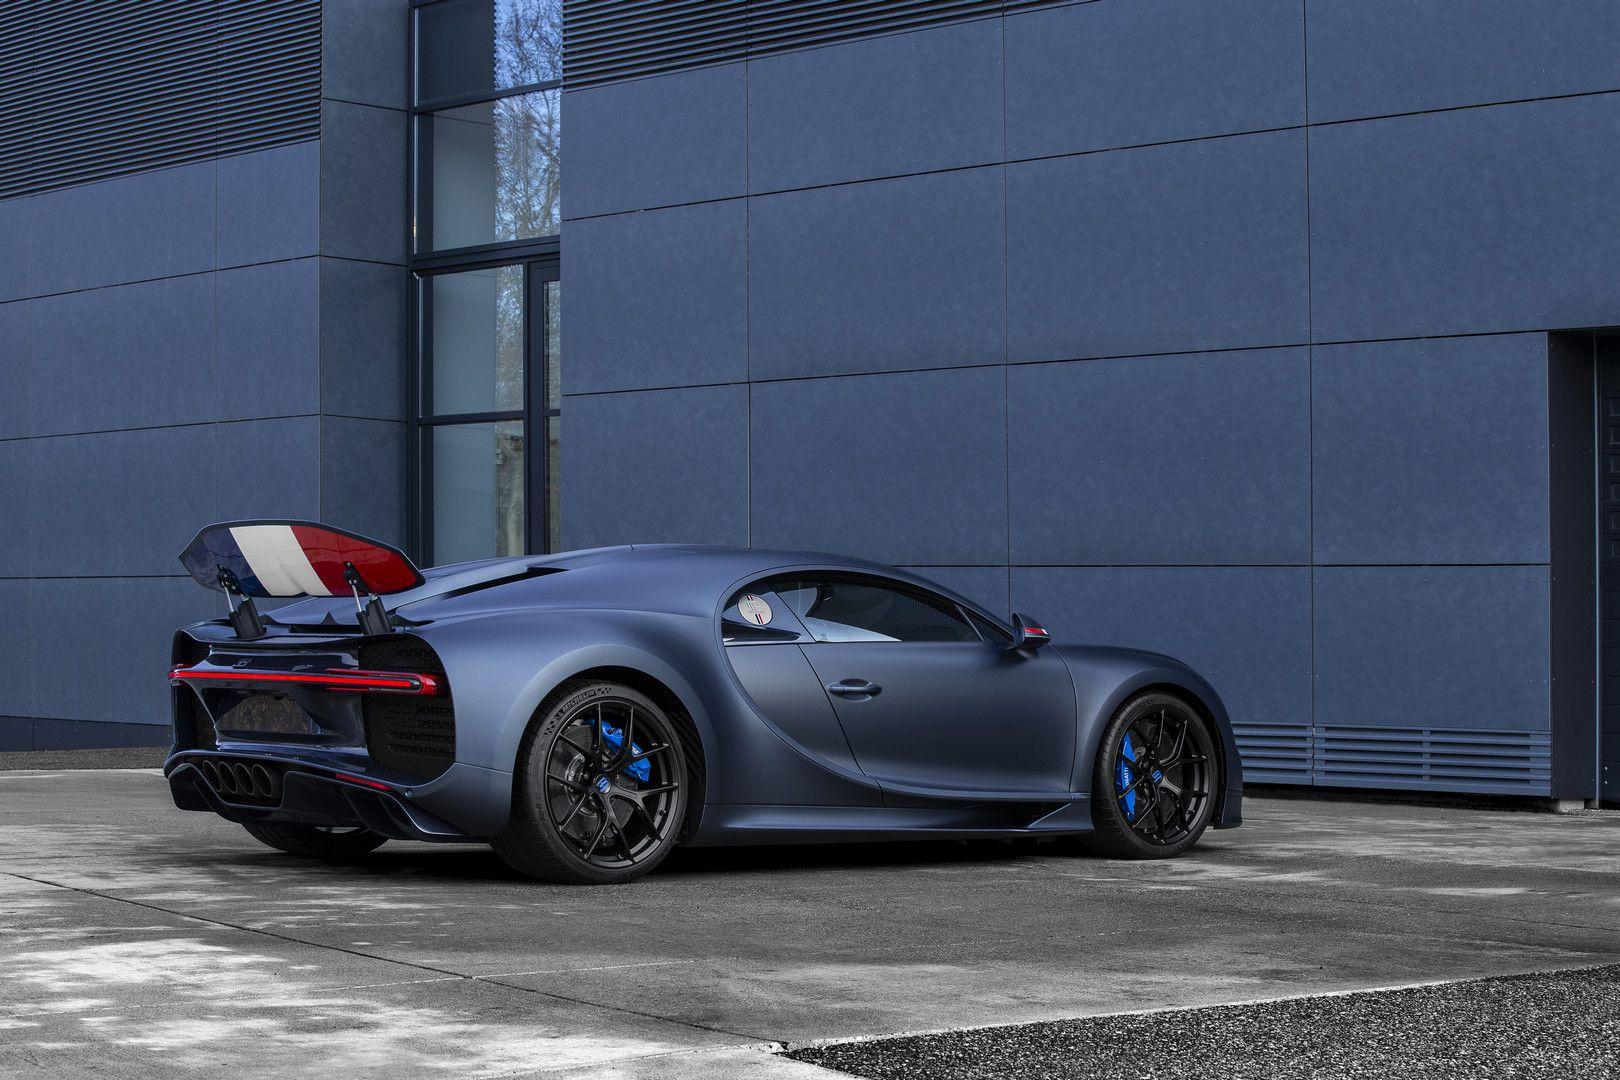 Bugatti Chiron Sport 110 Ans For Sale 1 Of 20 Worldwide Supercars For Sale In 2020 Bugatti Chiron Bugatti Sports Car